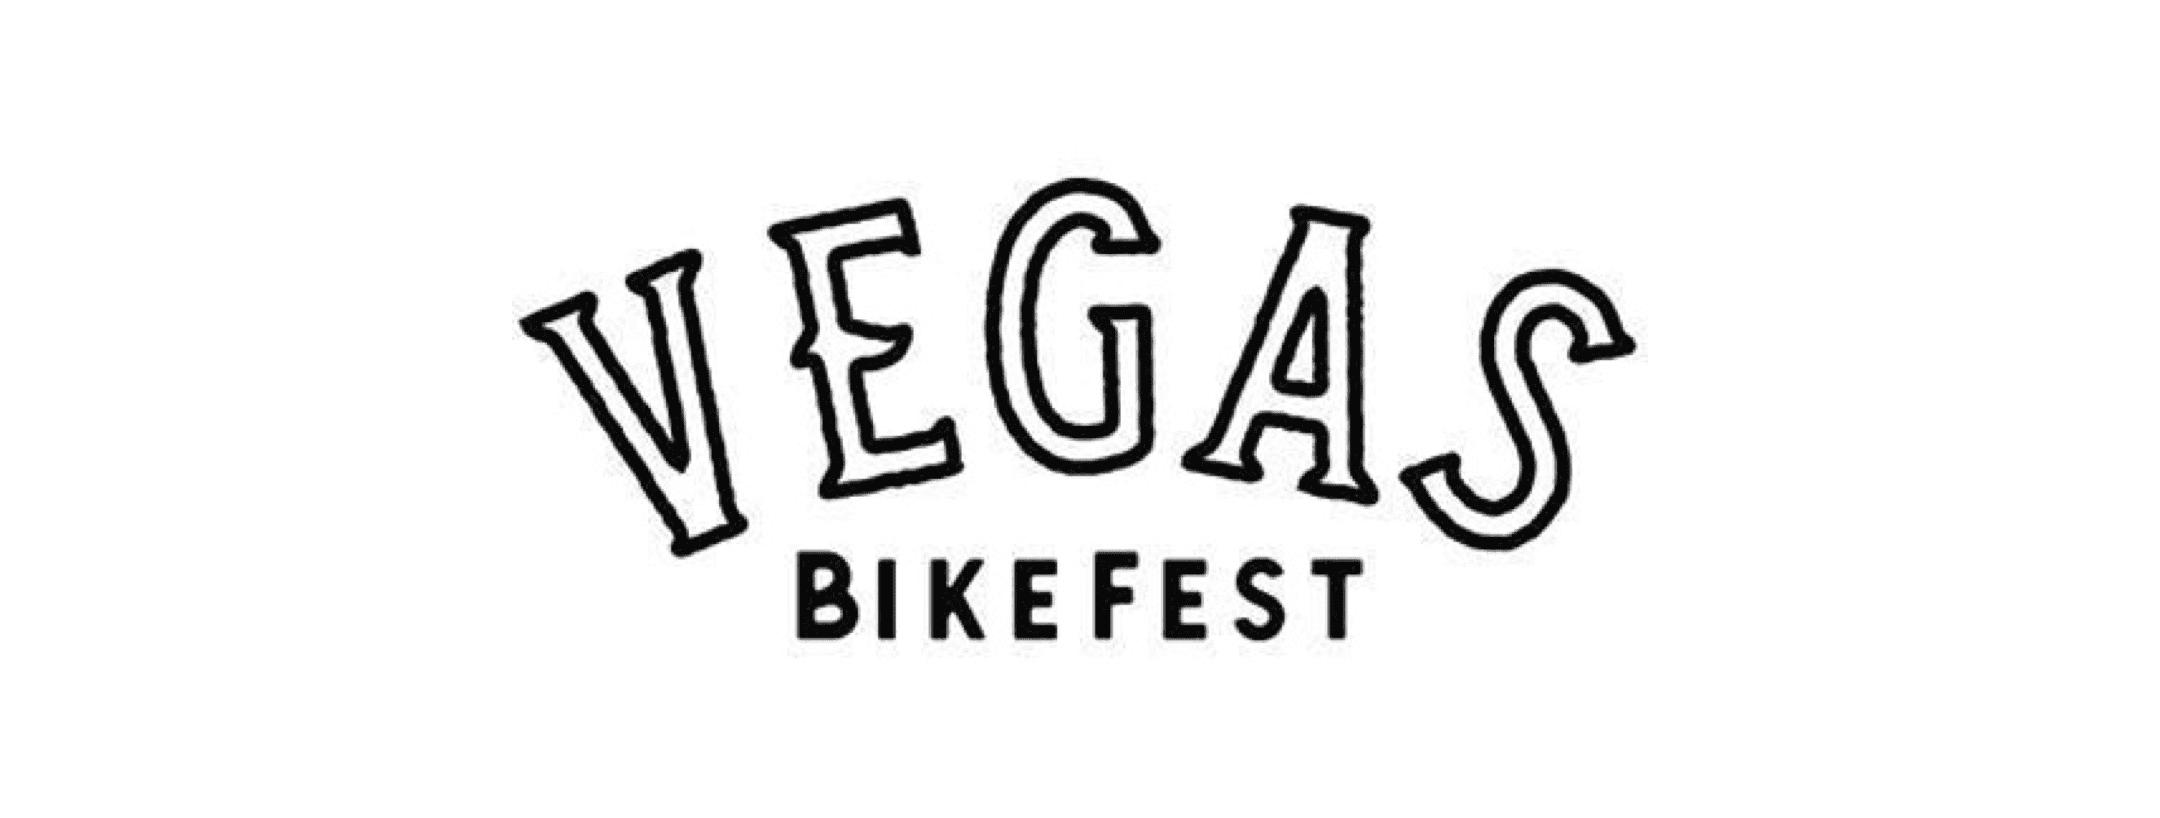 Vegas BikeFest